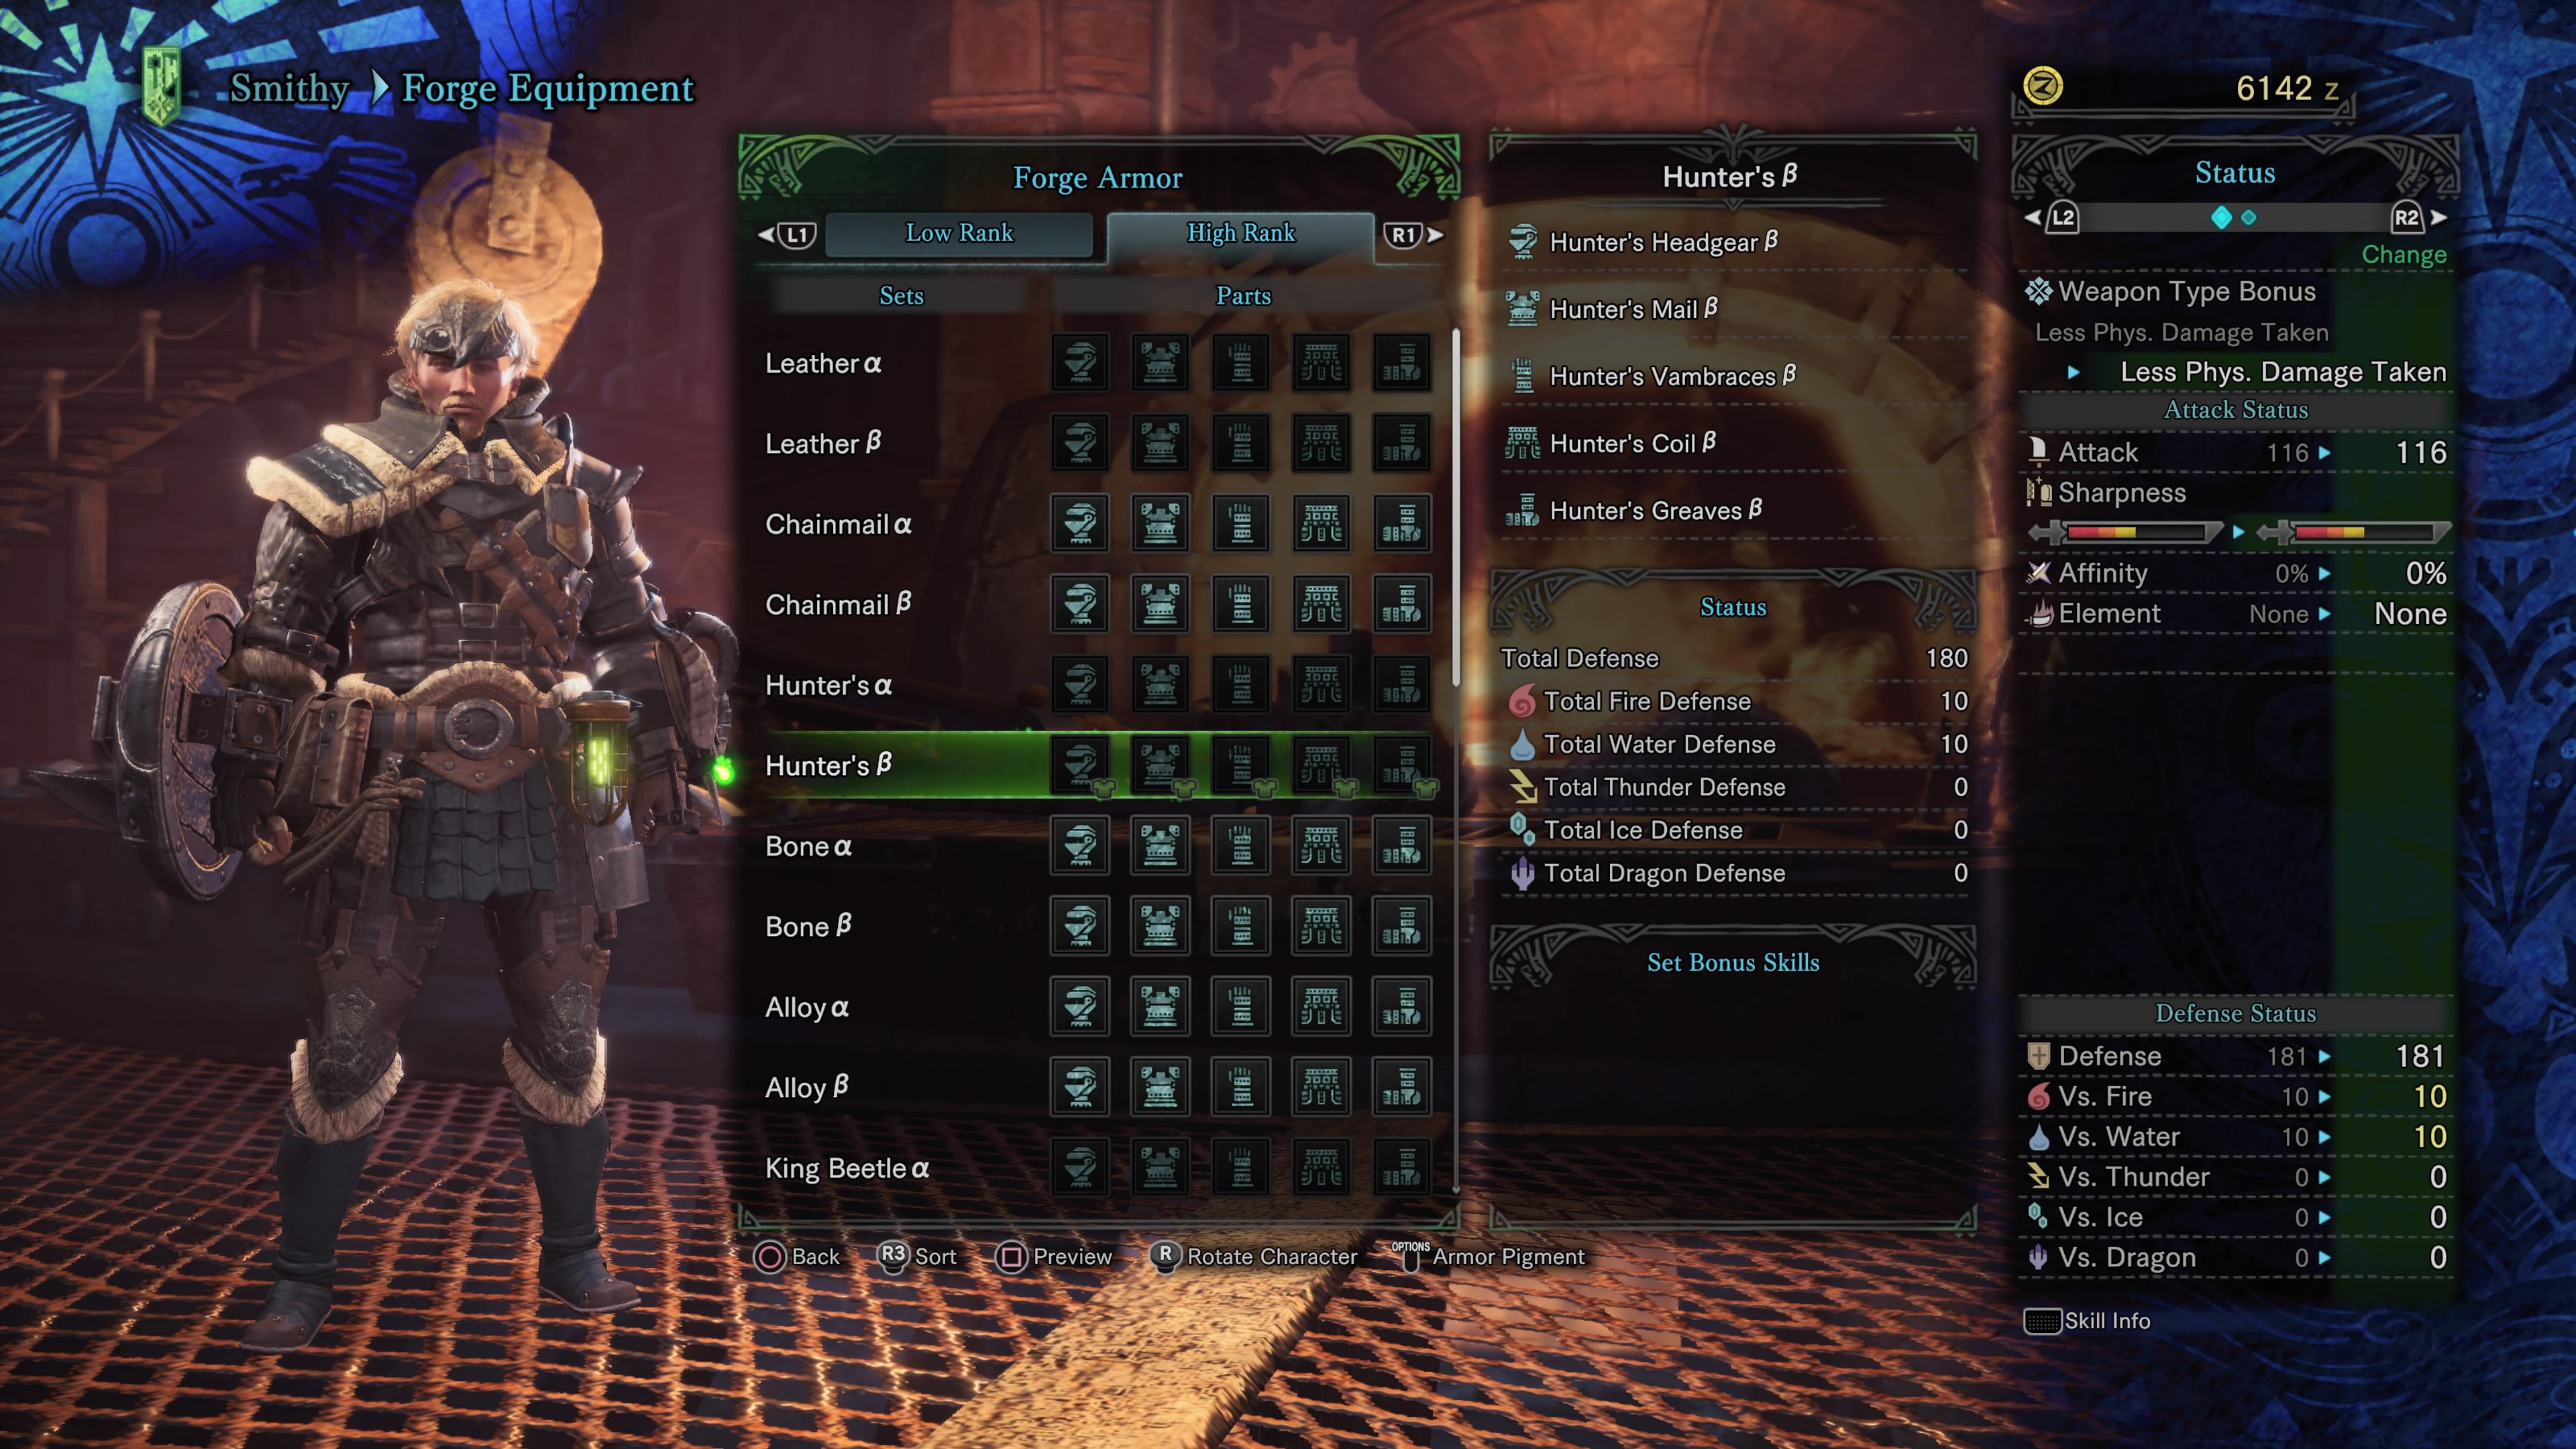 Monster Hunter World Armor Sets All High Rank Armor Sets And